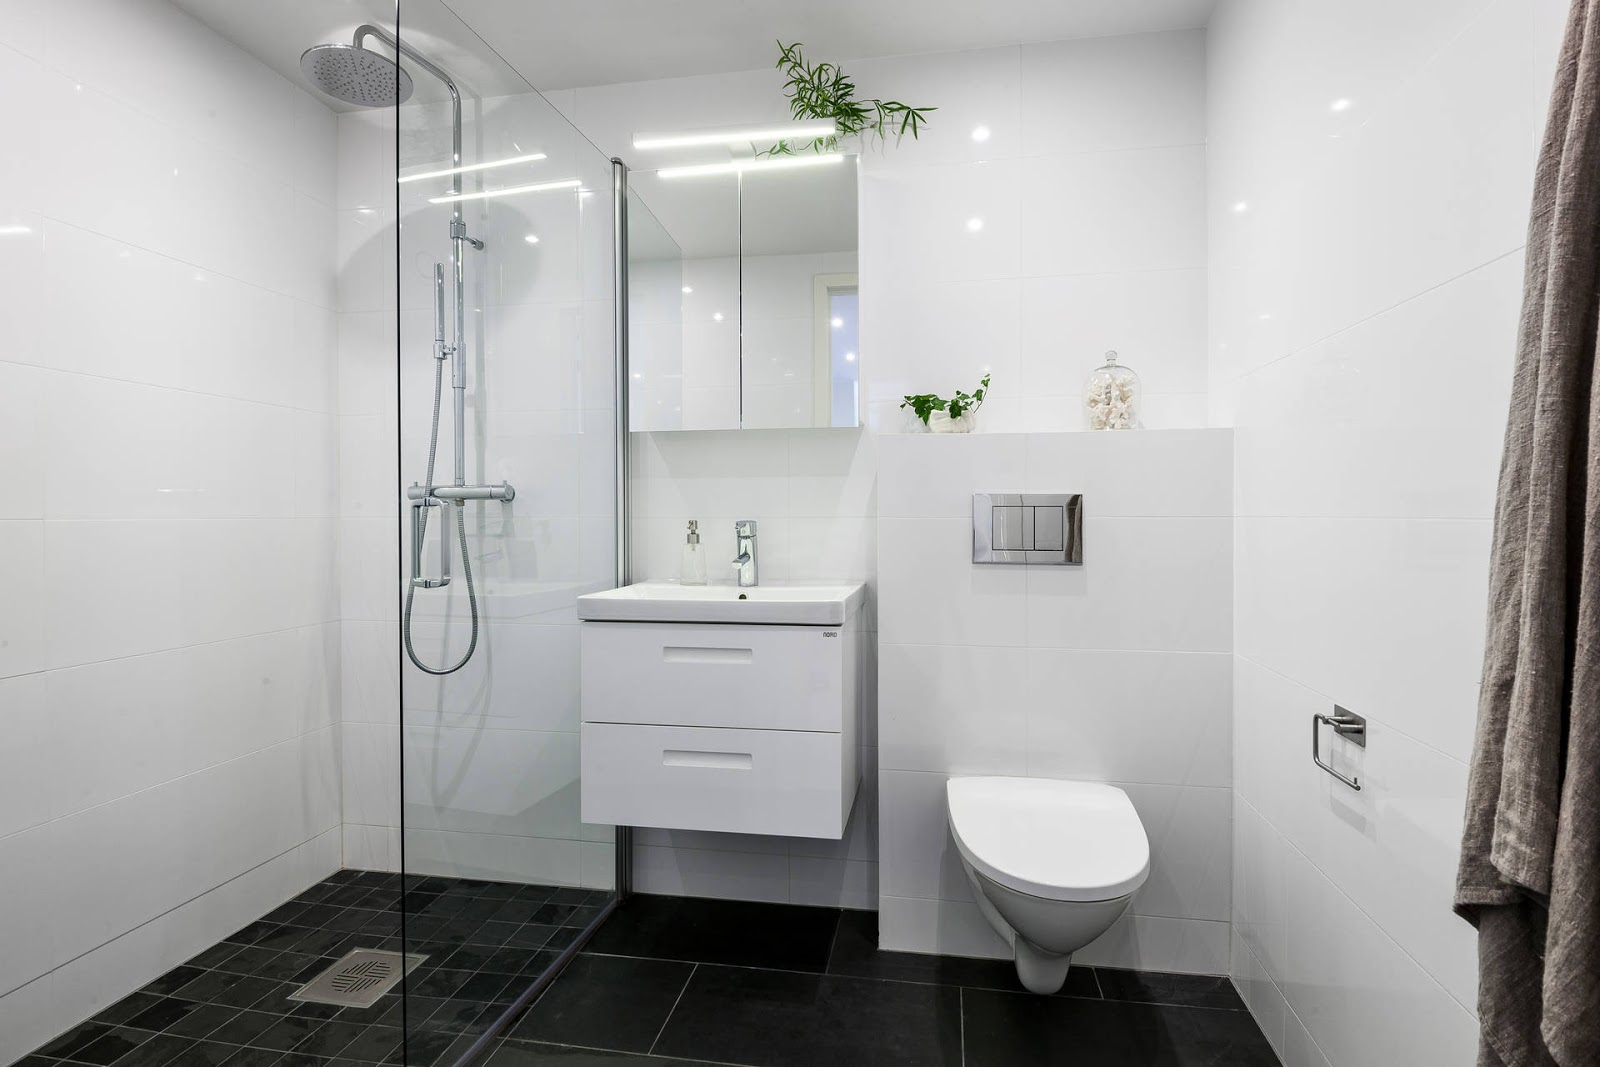 baño blanco estilo nordico white nordic decor lavabo lavamanos